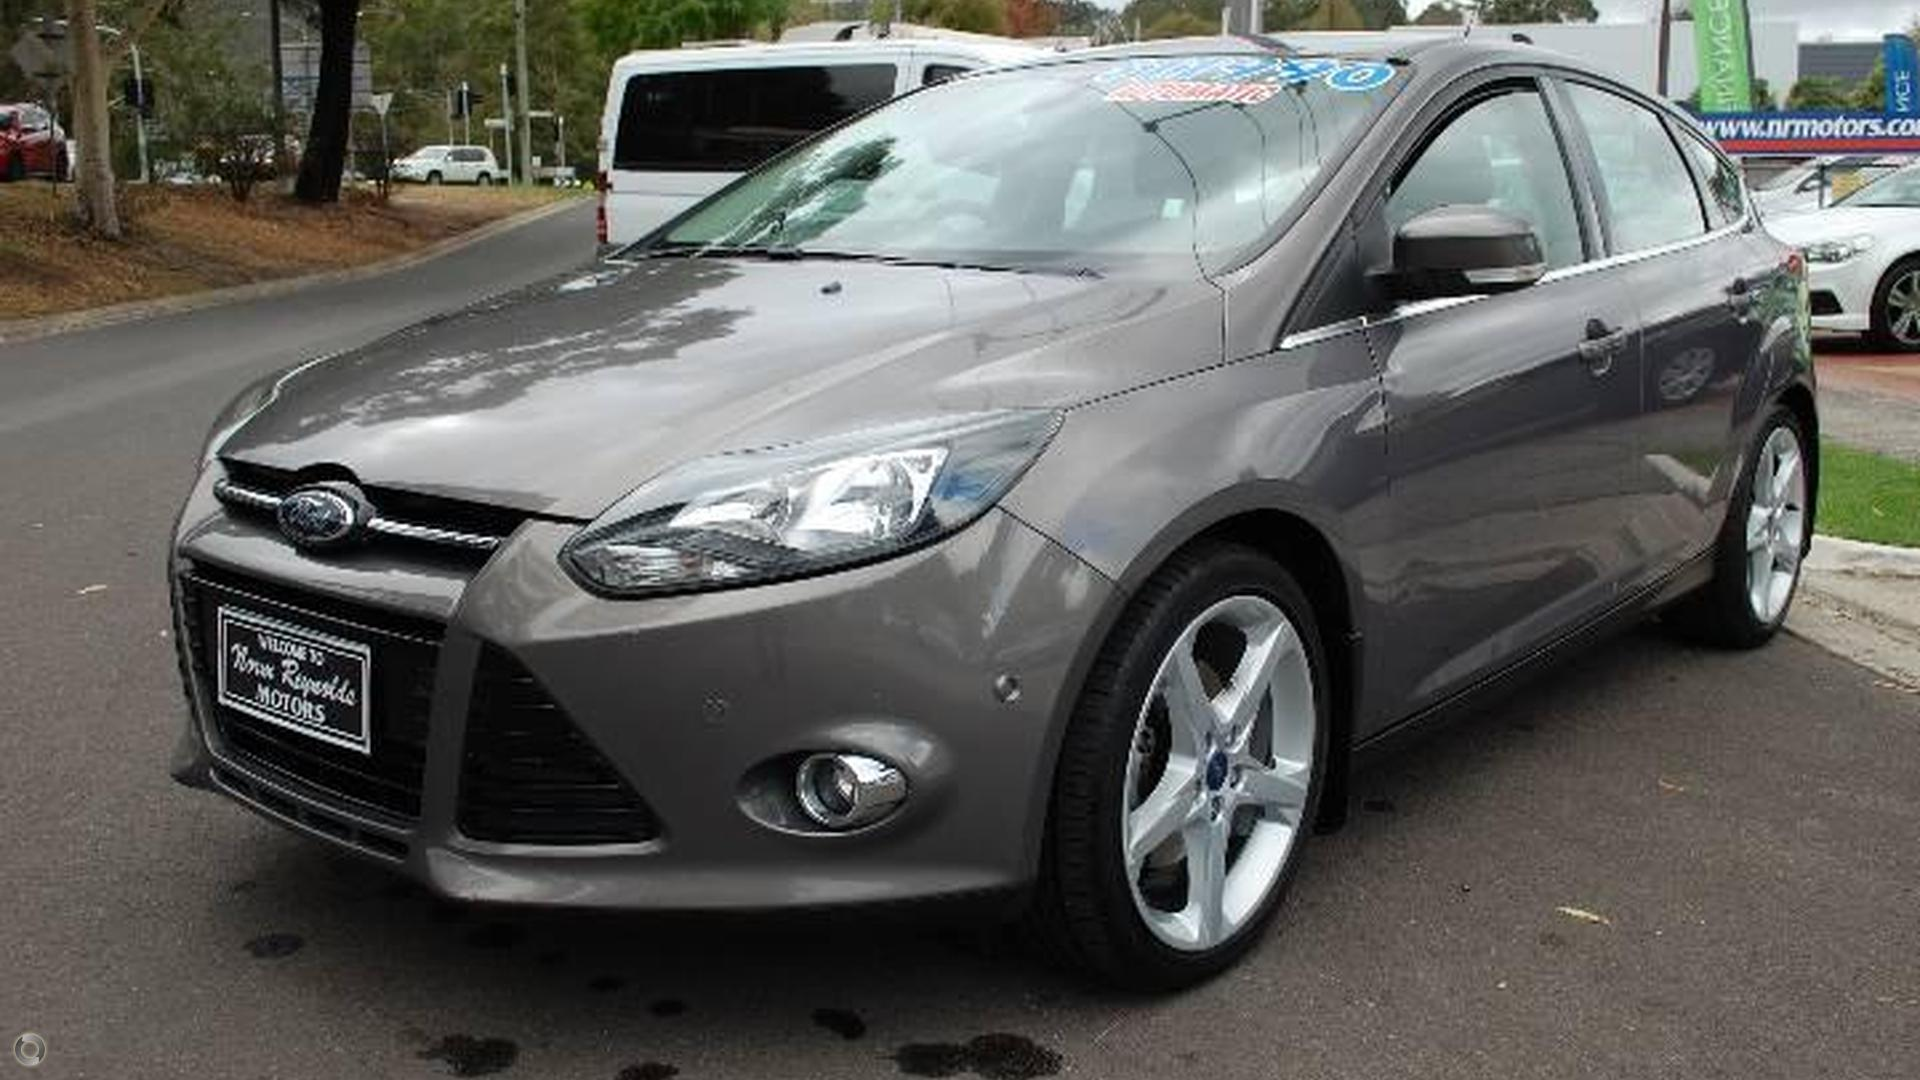 2011 Ford Focus Lw